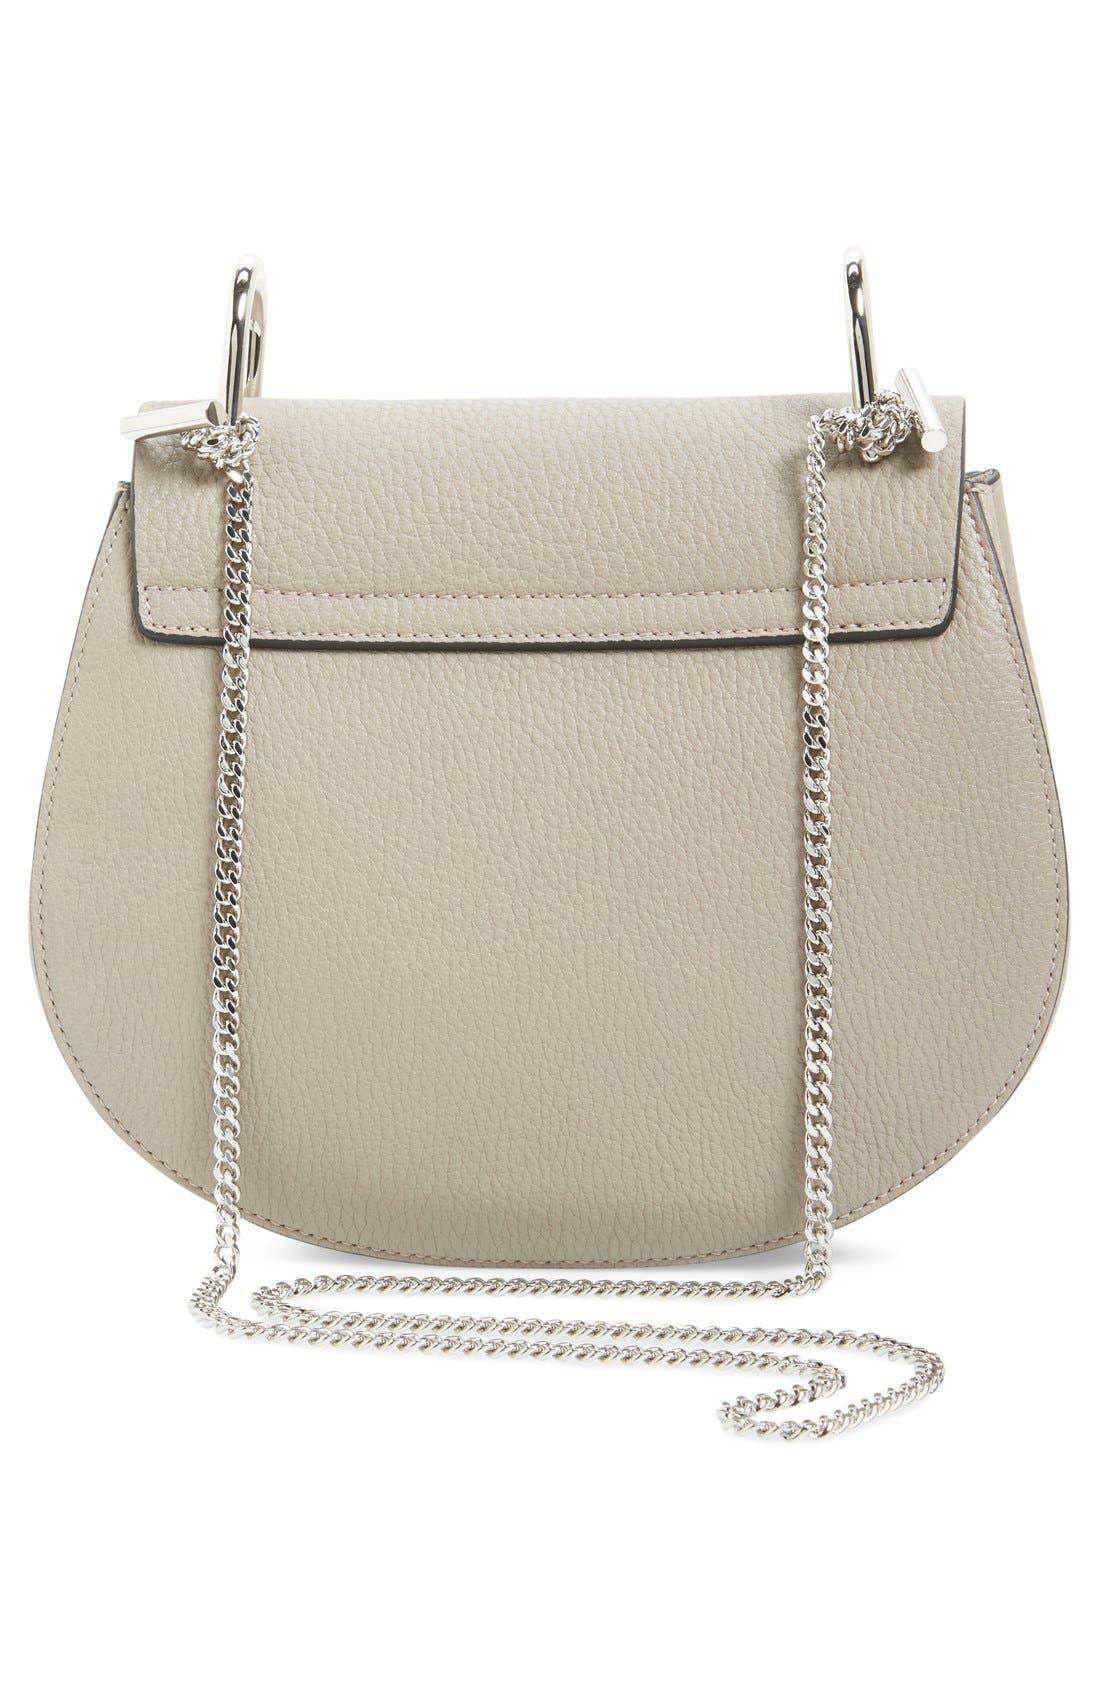 'Small Drew' Leather Shoulder Bag,                             Alternate thumbnail 3, color,                             Motty Grey